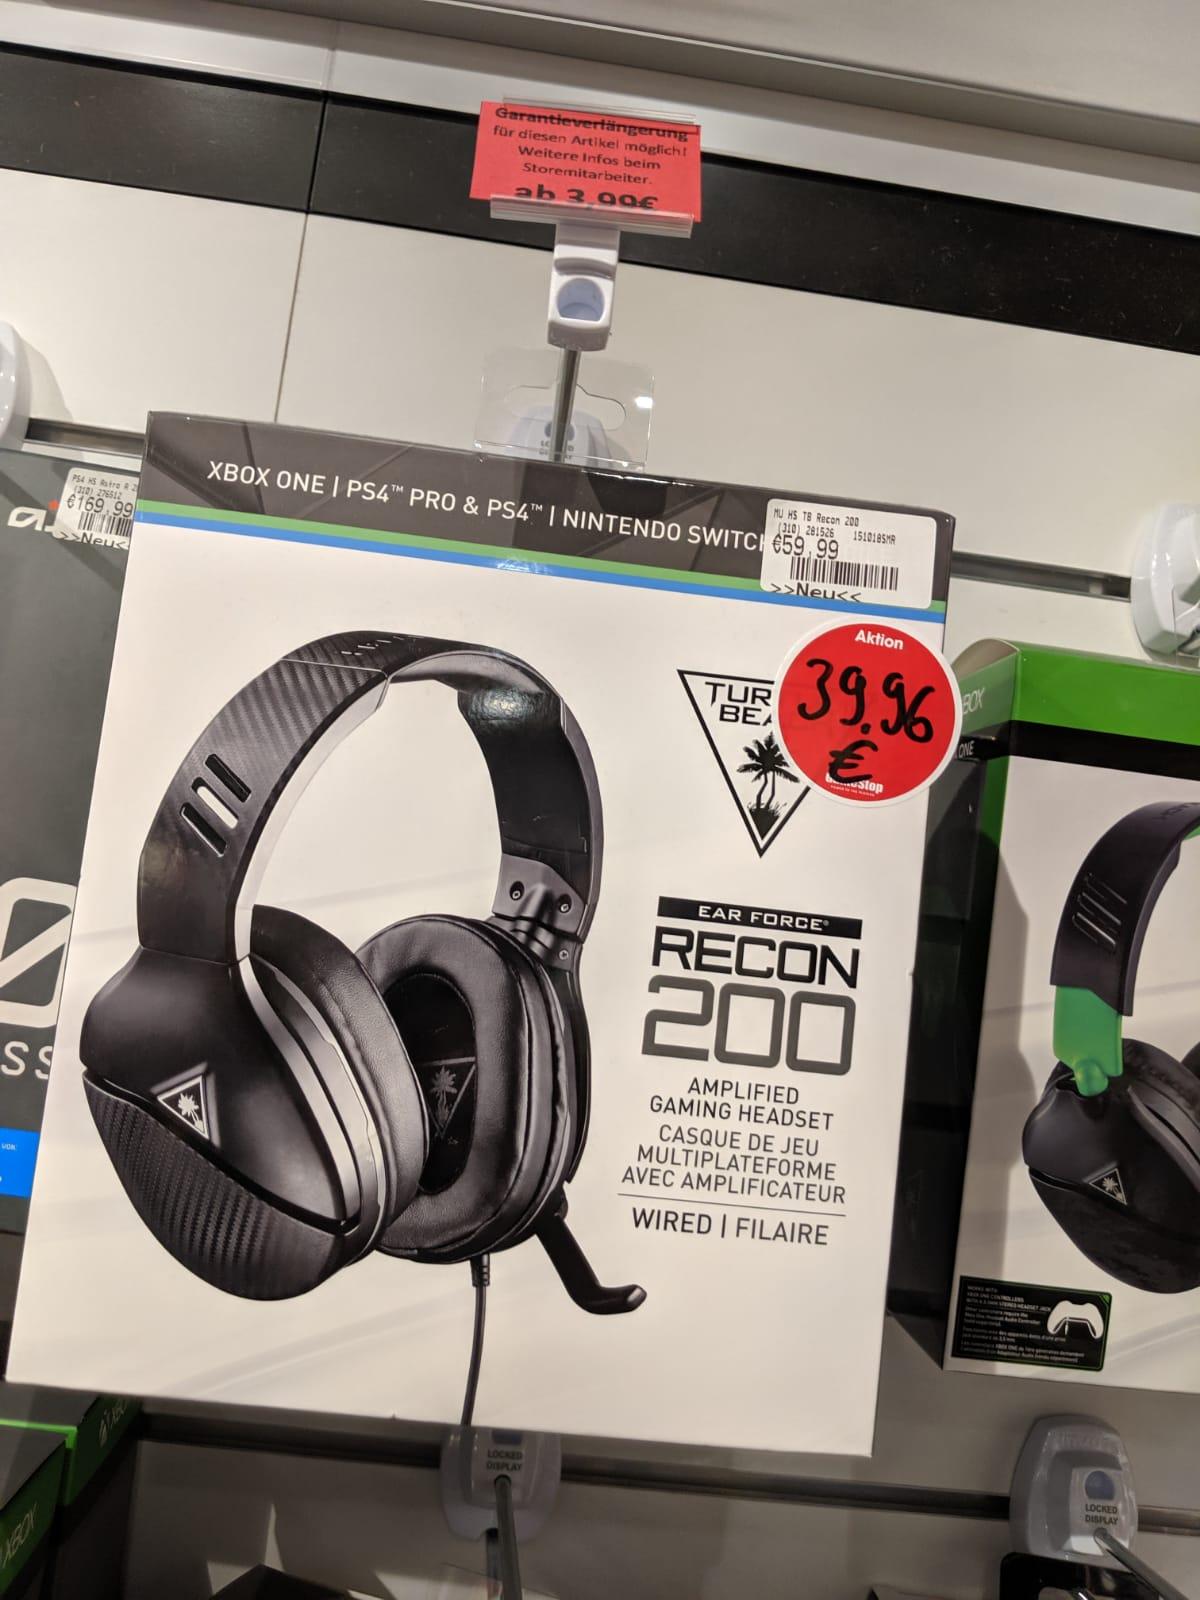 Turtle Beach Recon 200 Gaming-Headset - Gamestop Spandau Arcaden [Lokal]